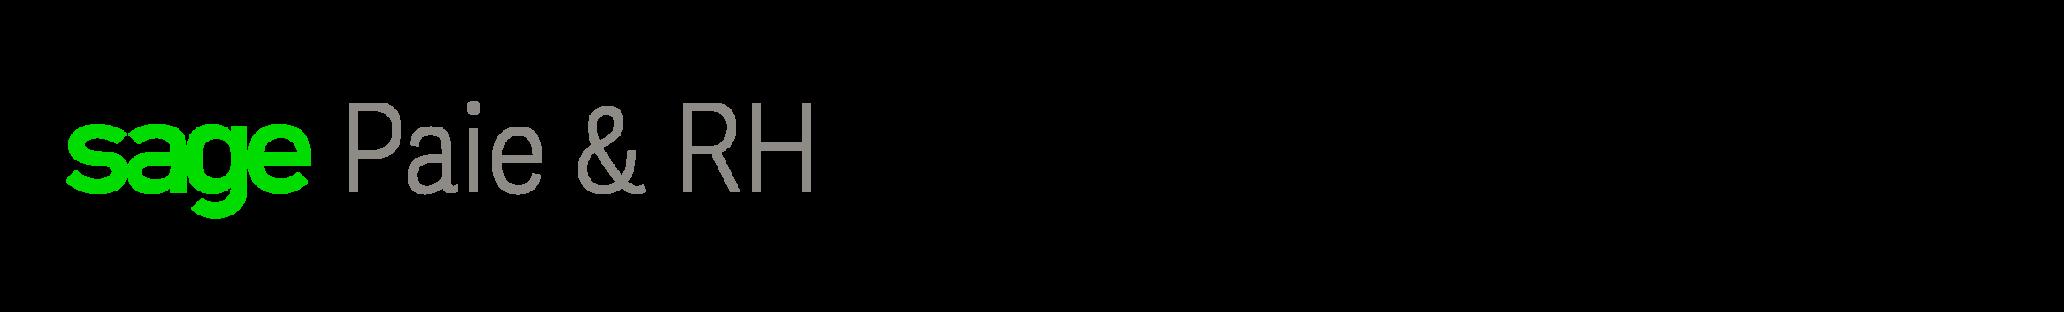 Mercuria Logo sage Paie & RH